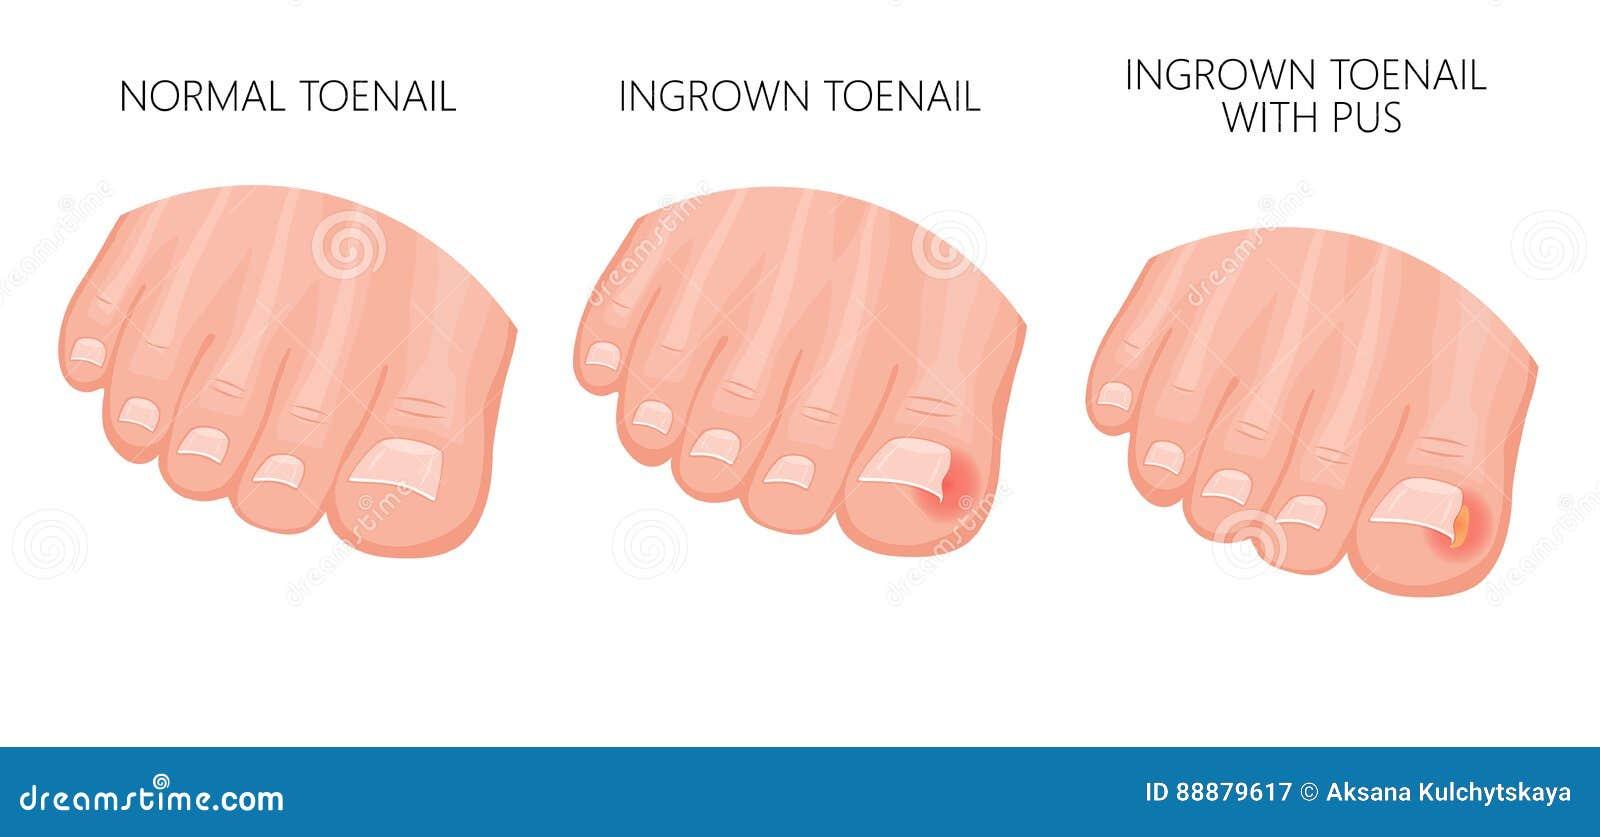 Ingrown Toenail stock vector. Illustration of fungal - 88879617